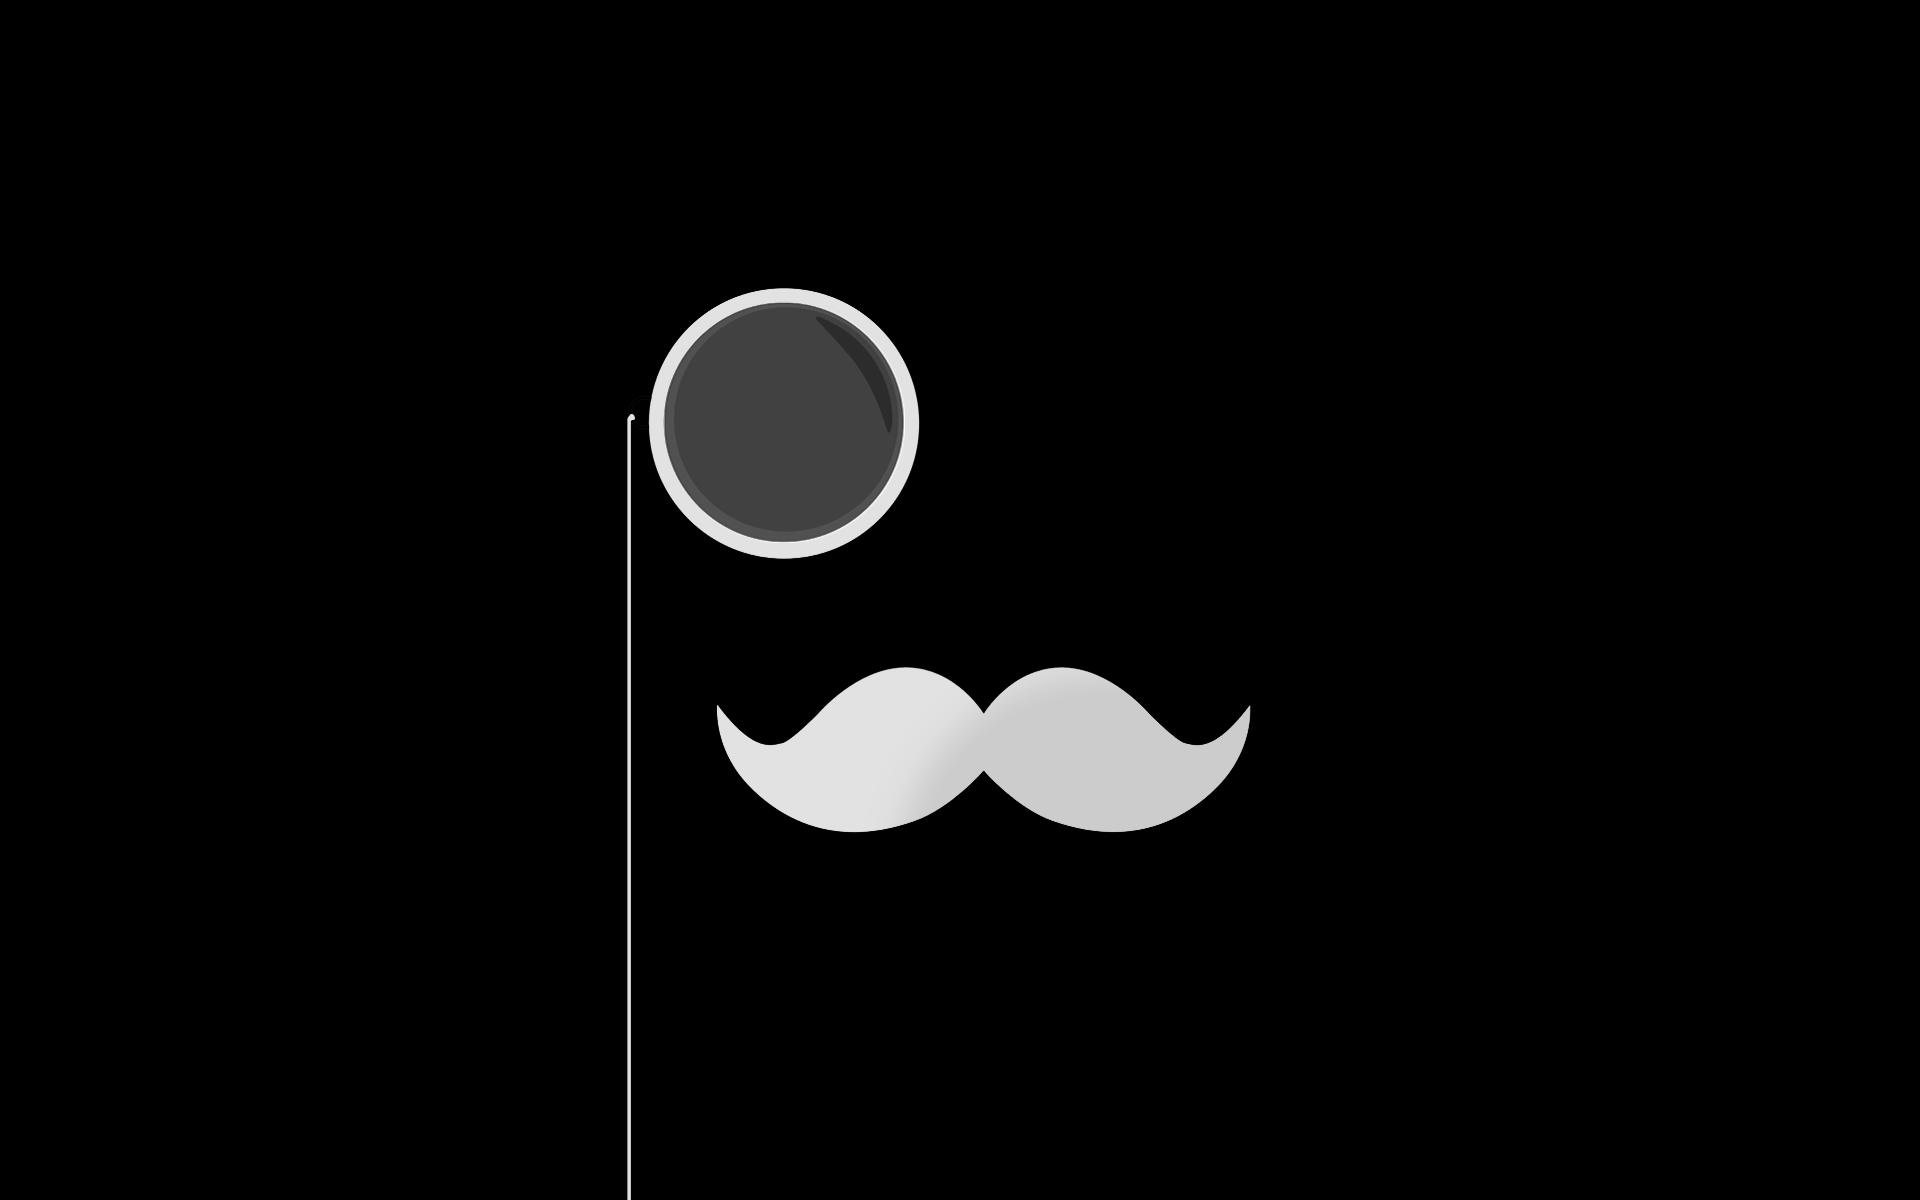 mustache iphone wallpaper hd - photo #30